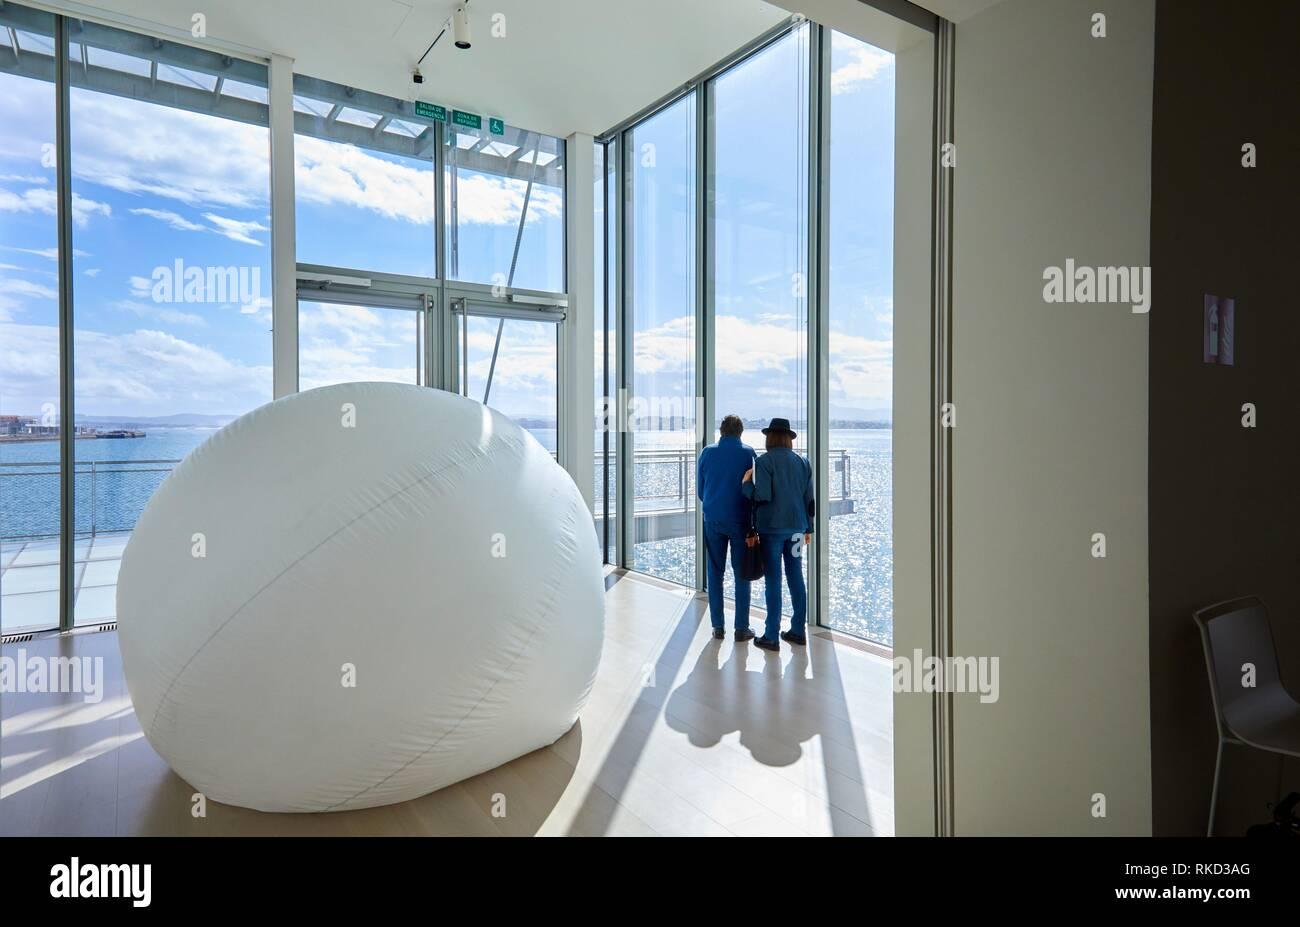 Botin Center Museum Art and Culture, Architect Renzo Piano, Santander bay, Santander, Cantabria, Spain, Europe - Stock Image